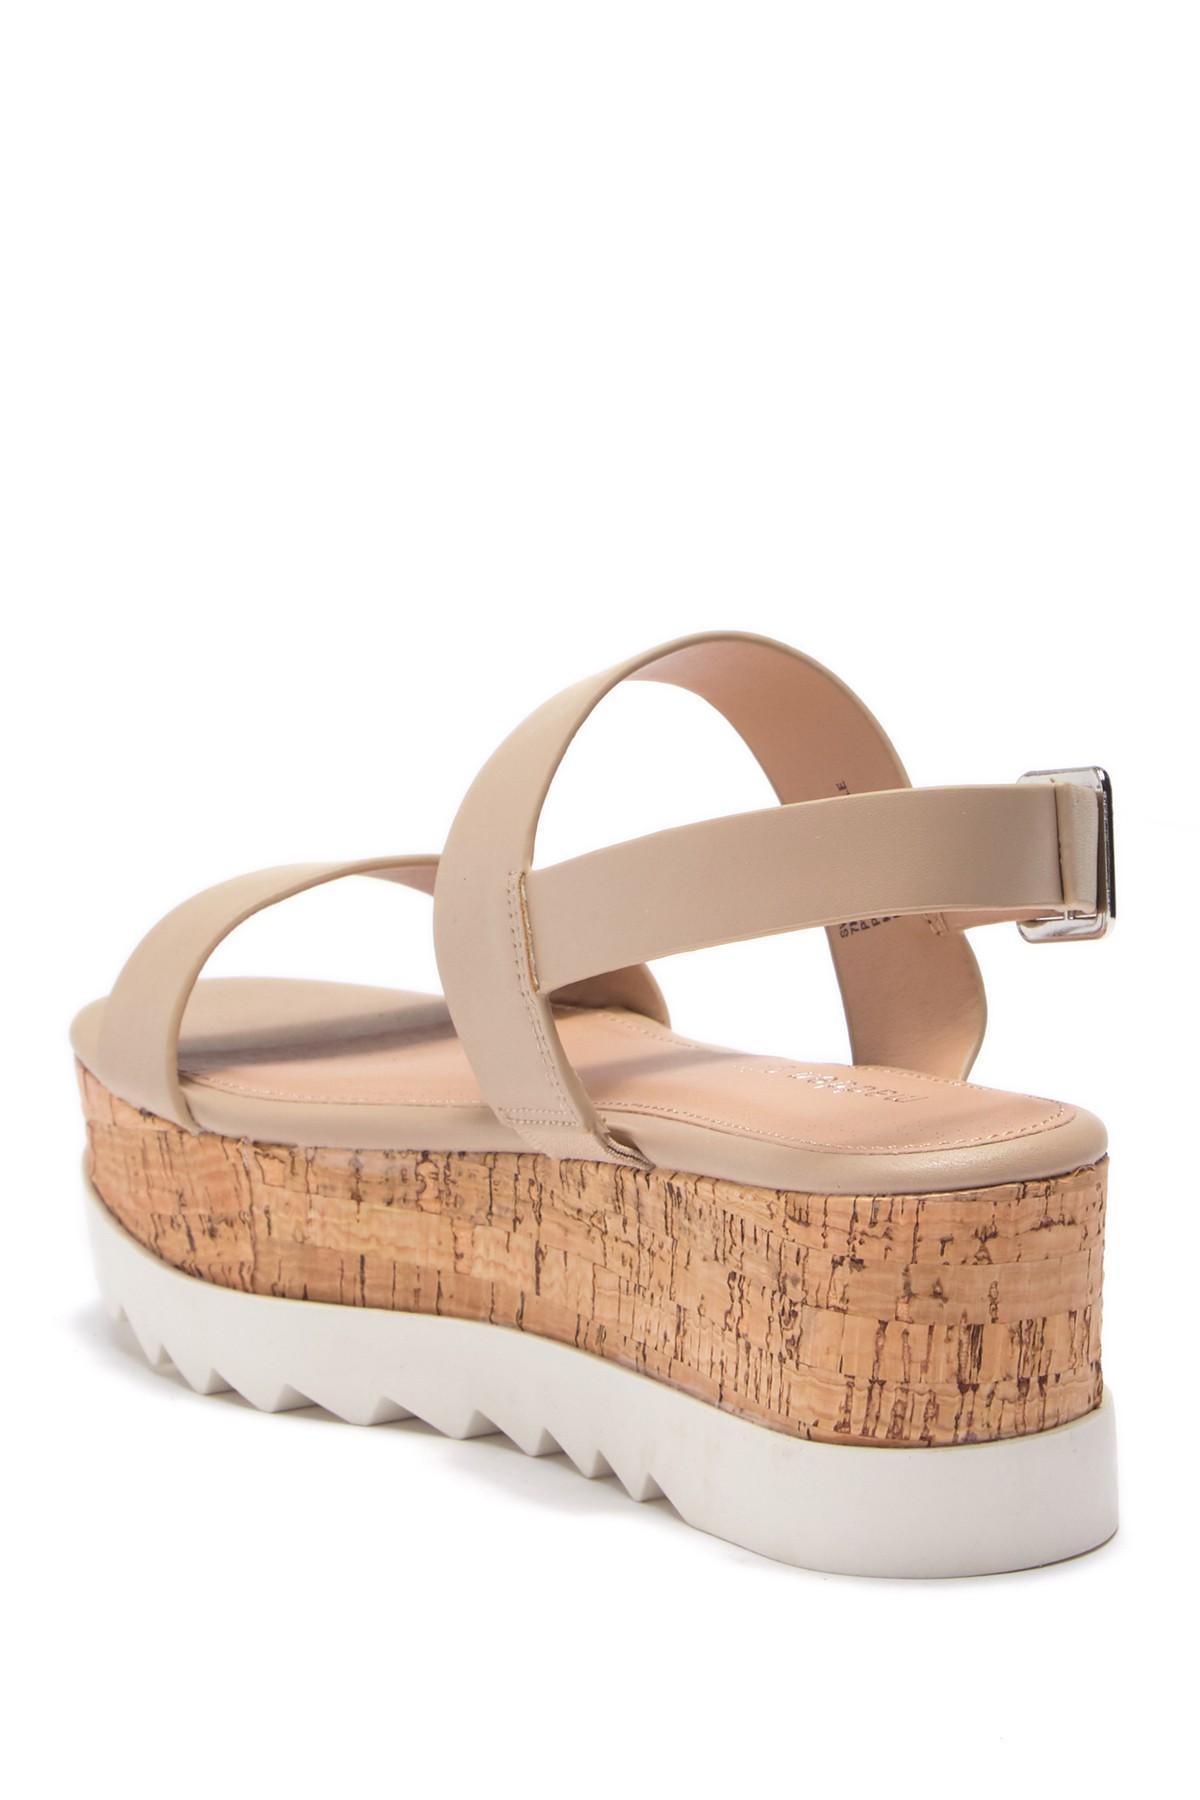 560d7a94cb4 Lyst - Madden Girl Sugar Platform Strappy Sandal